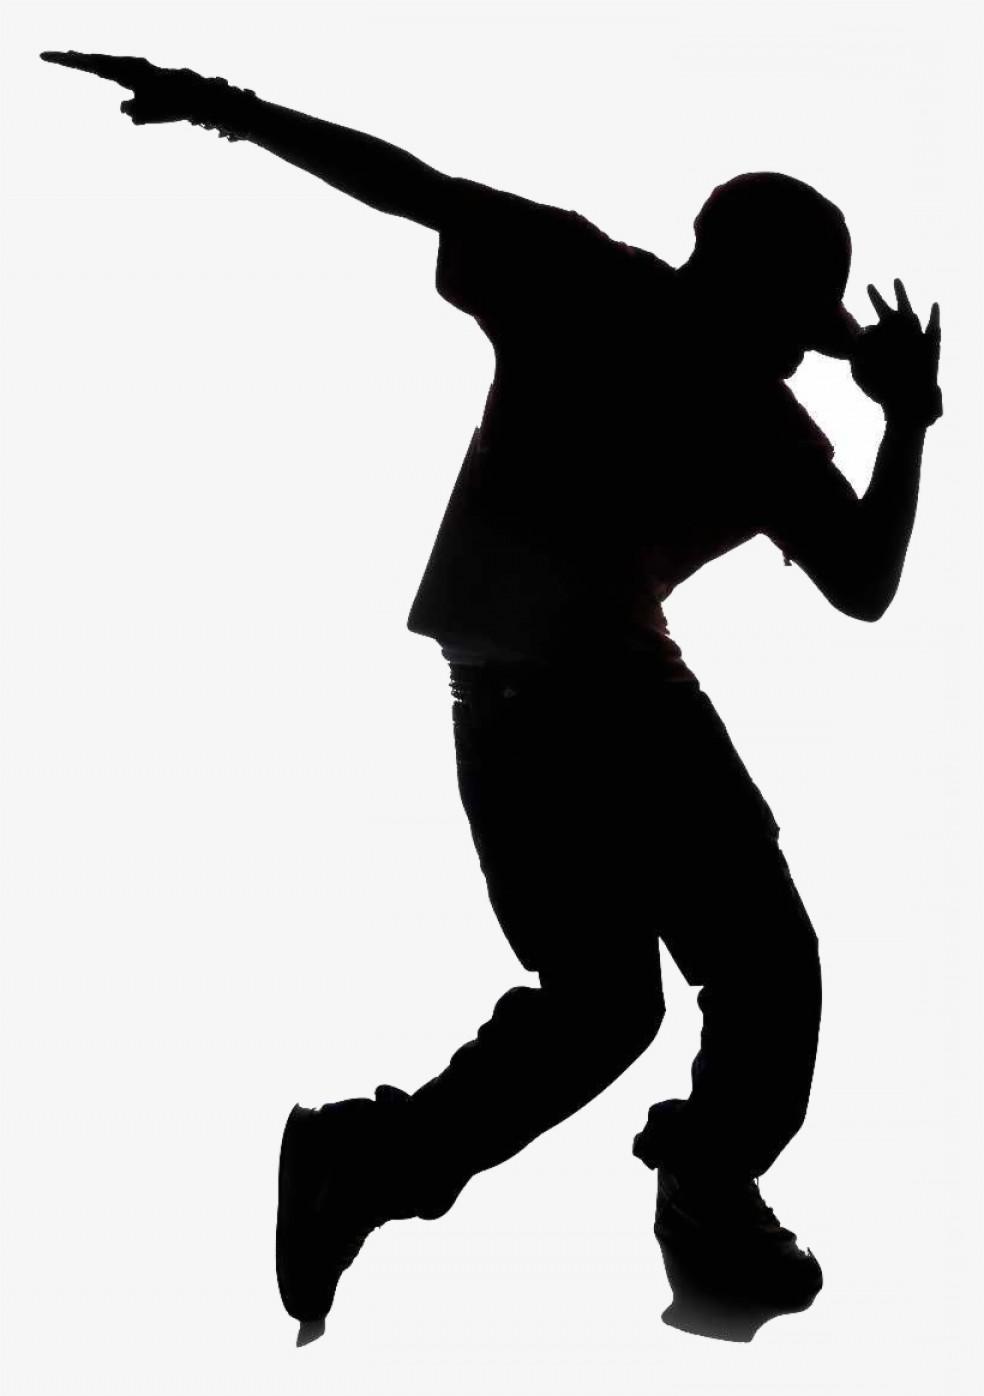 Hip hop dancer clipart jpg library download Uqeuyrtwhip Hop Dancing Clipart Png Hip Hop Dance | SOIDERGI jpg library download